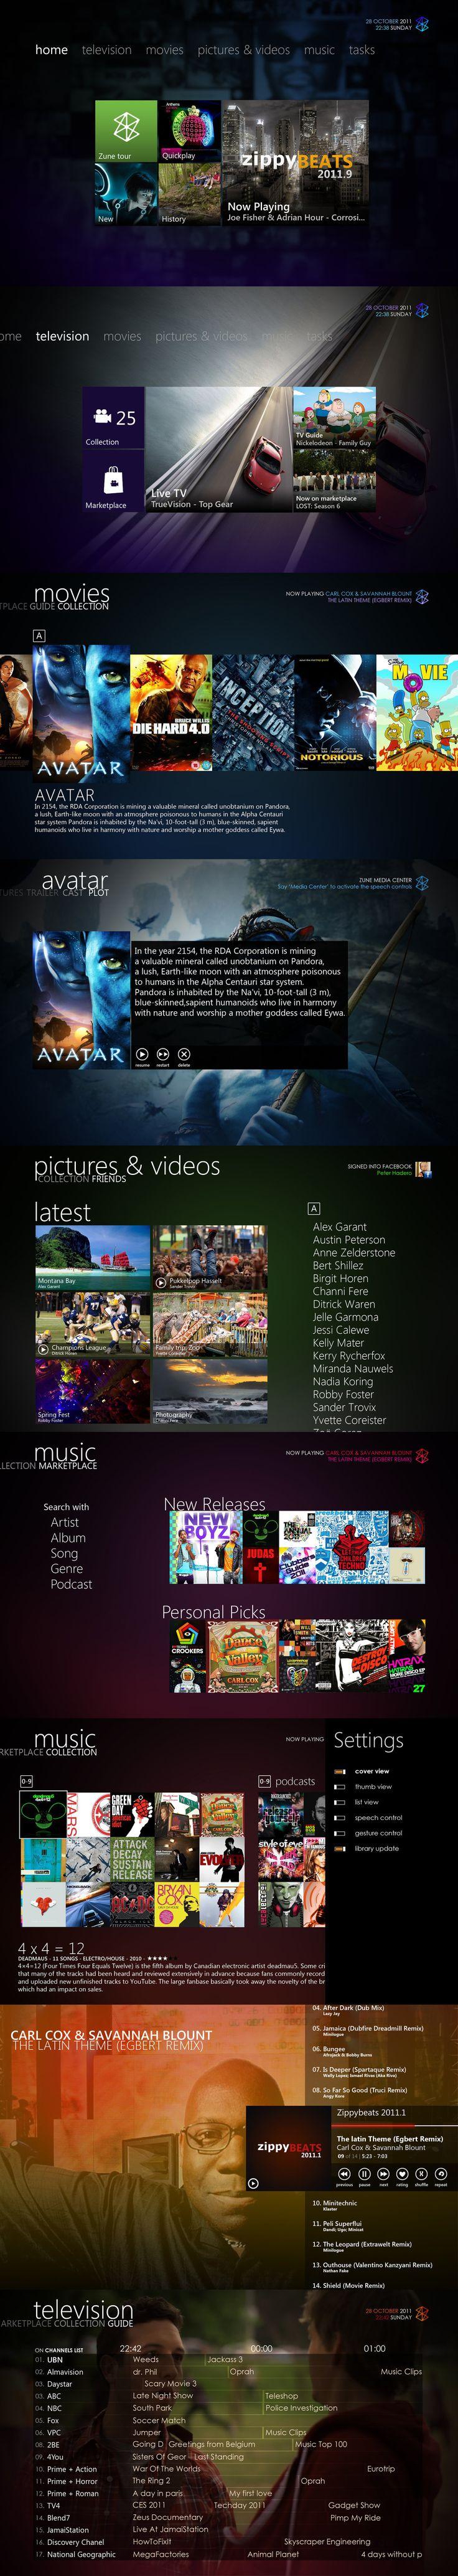 Zune Media Center 3.1 by ~Bonkietje on deviantART